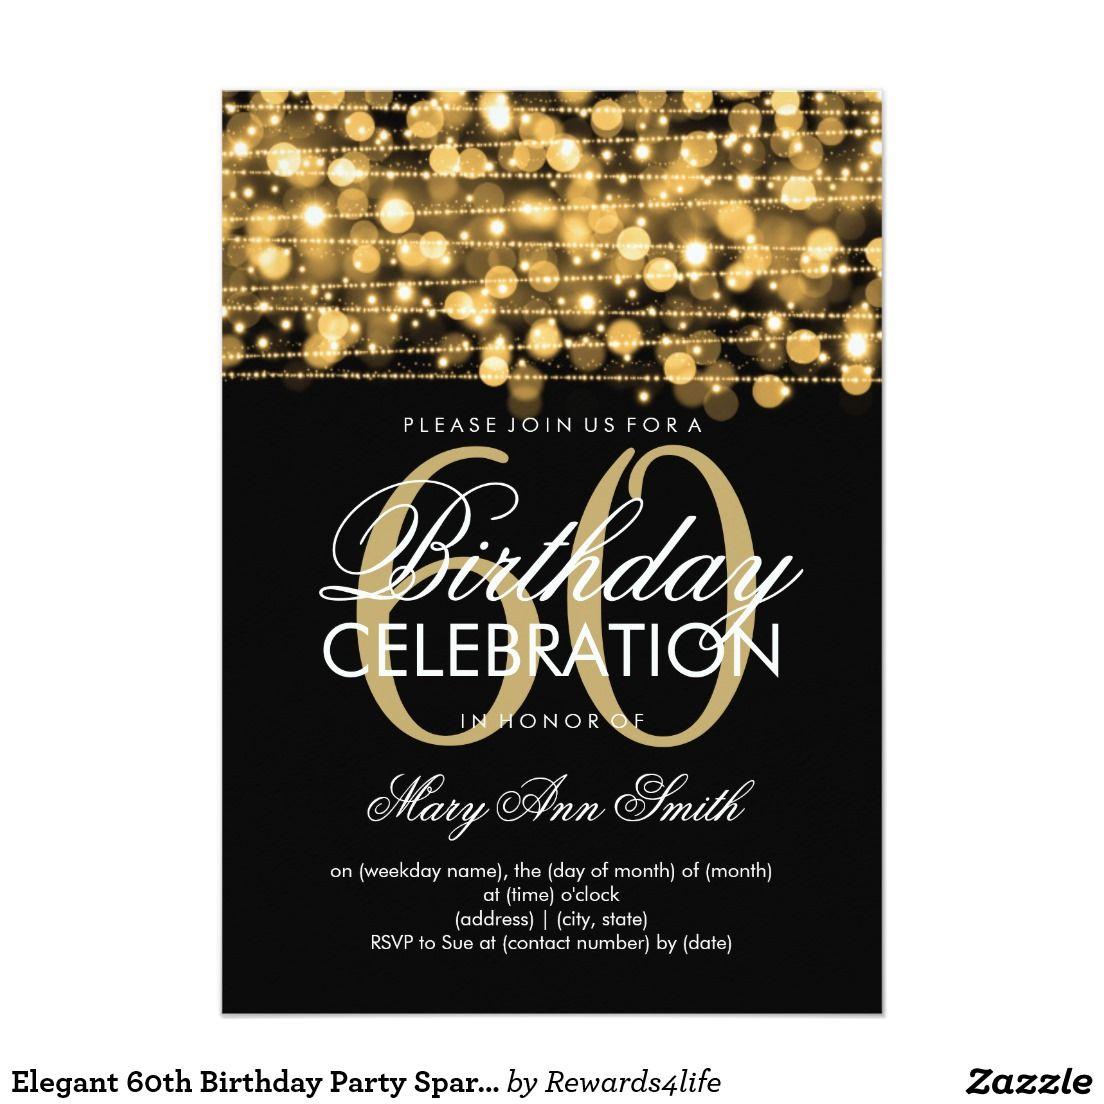 Elegant 60th Birthday Party Sparkles Gold Card Birthdays 90th